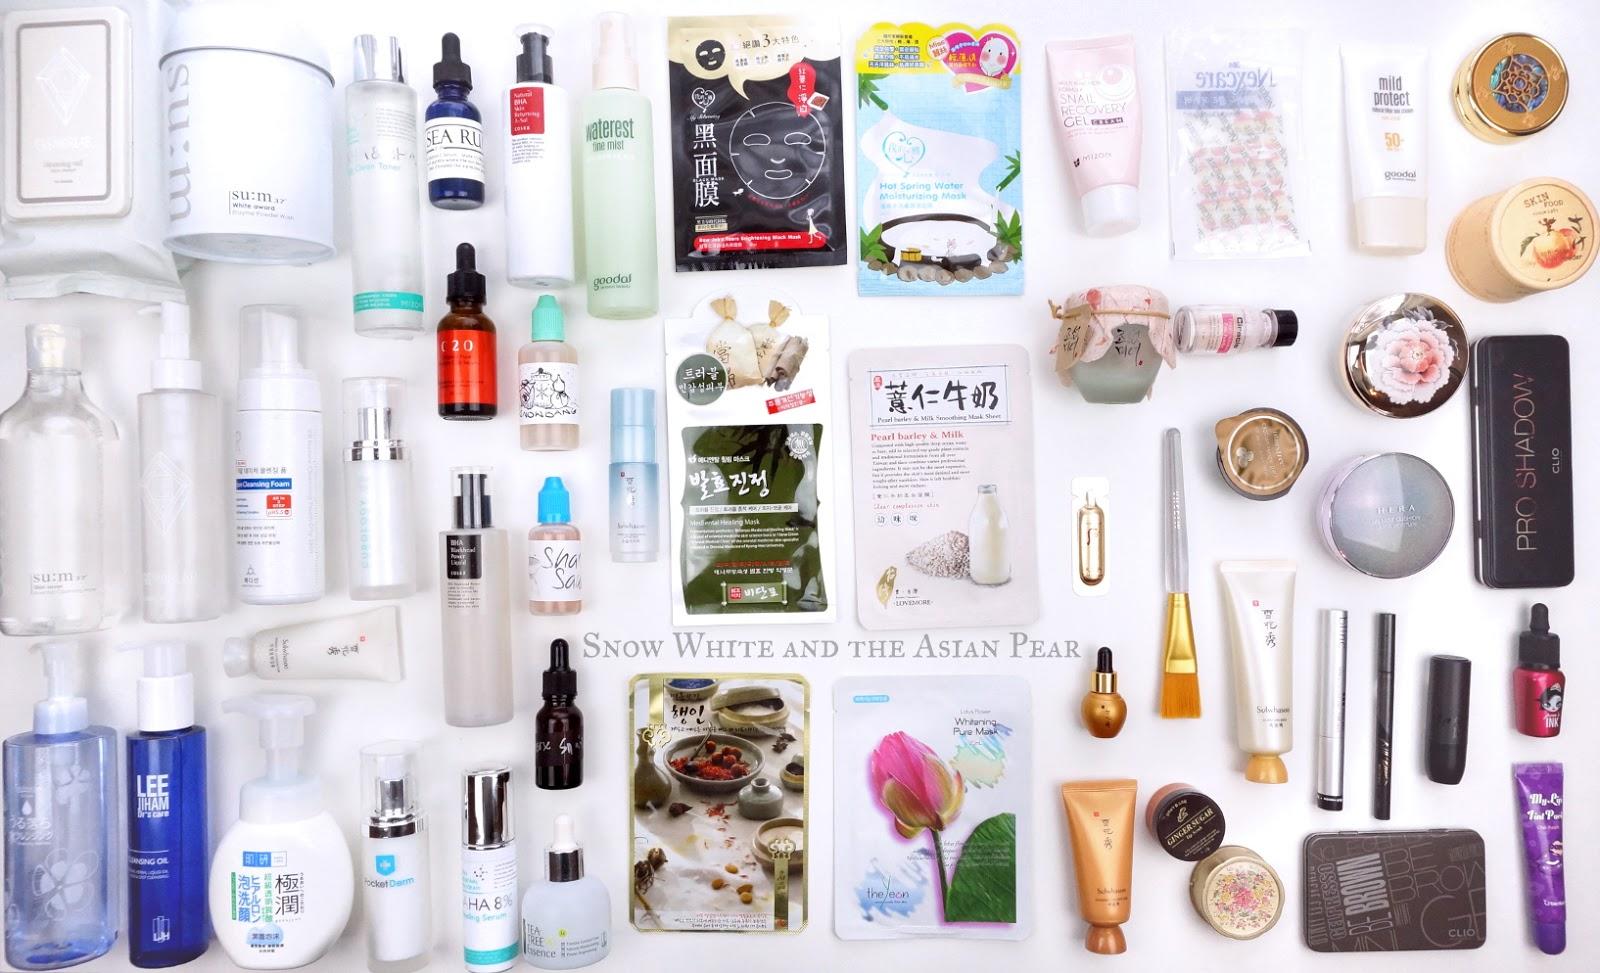 Whats In My Skincare Wardrobe Actives Prescriptions Antioxidants Secret Key Honey Bee Ac Control Mist 100ml For Sensitive Skin Current Winter 2016